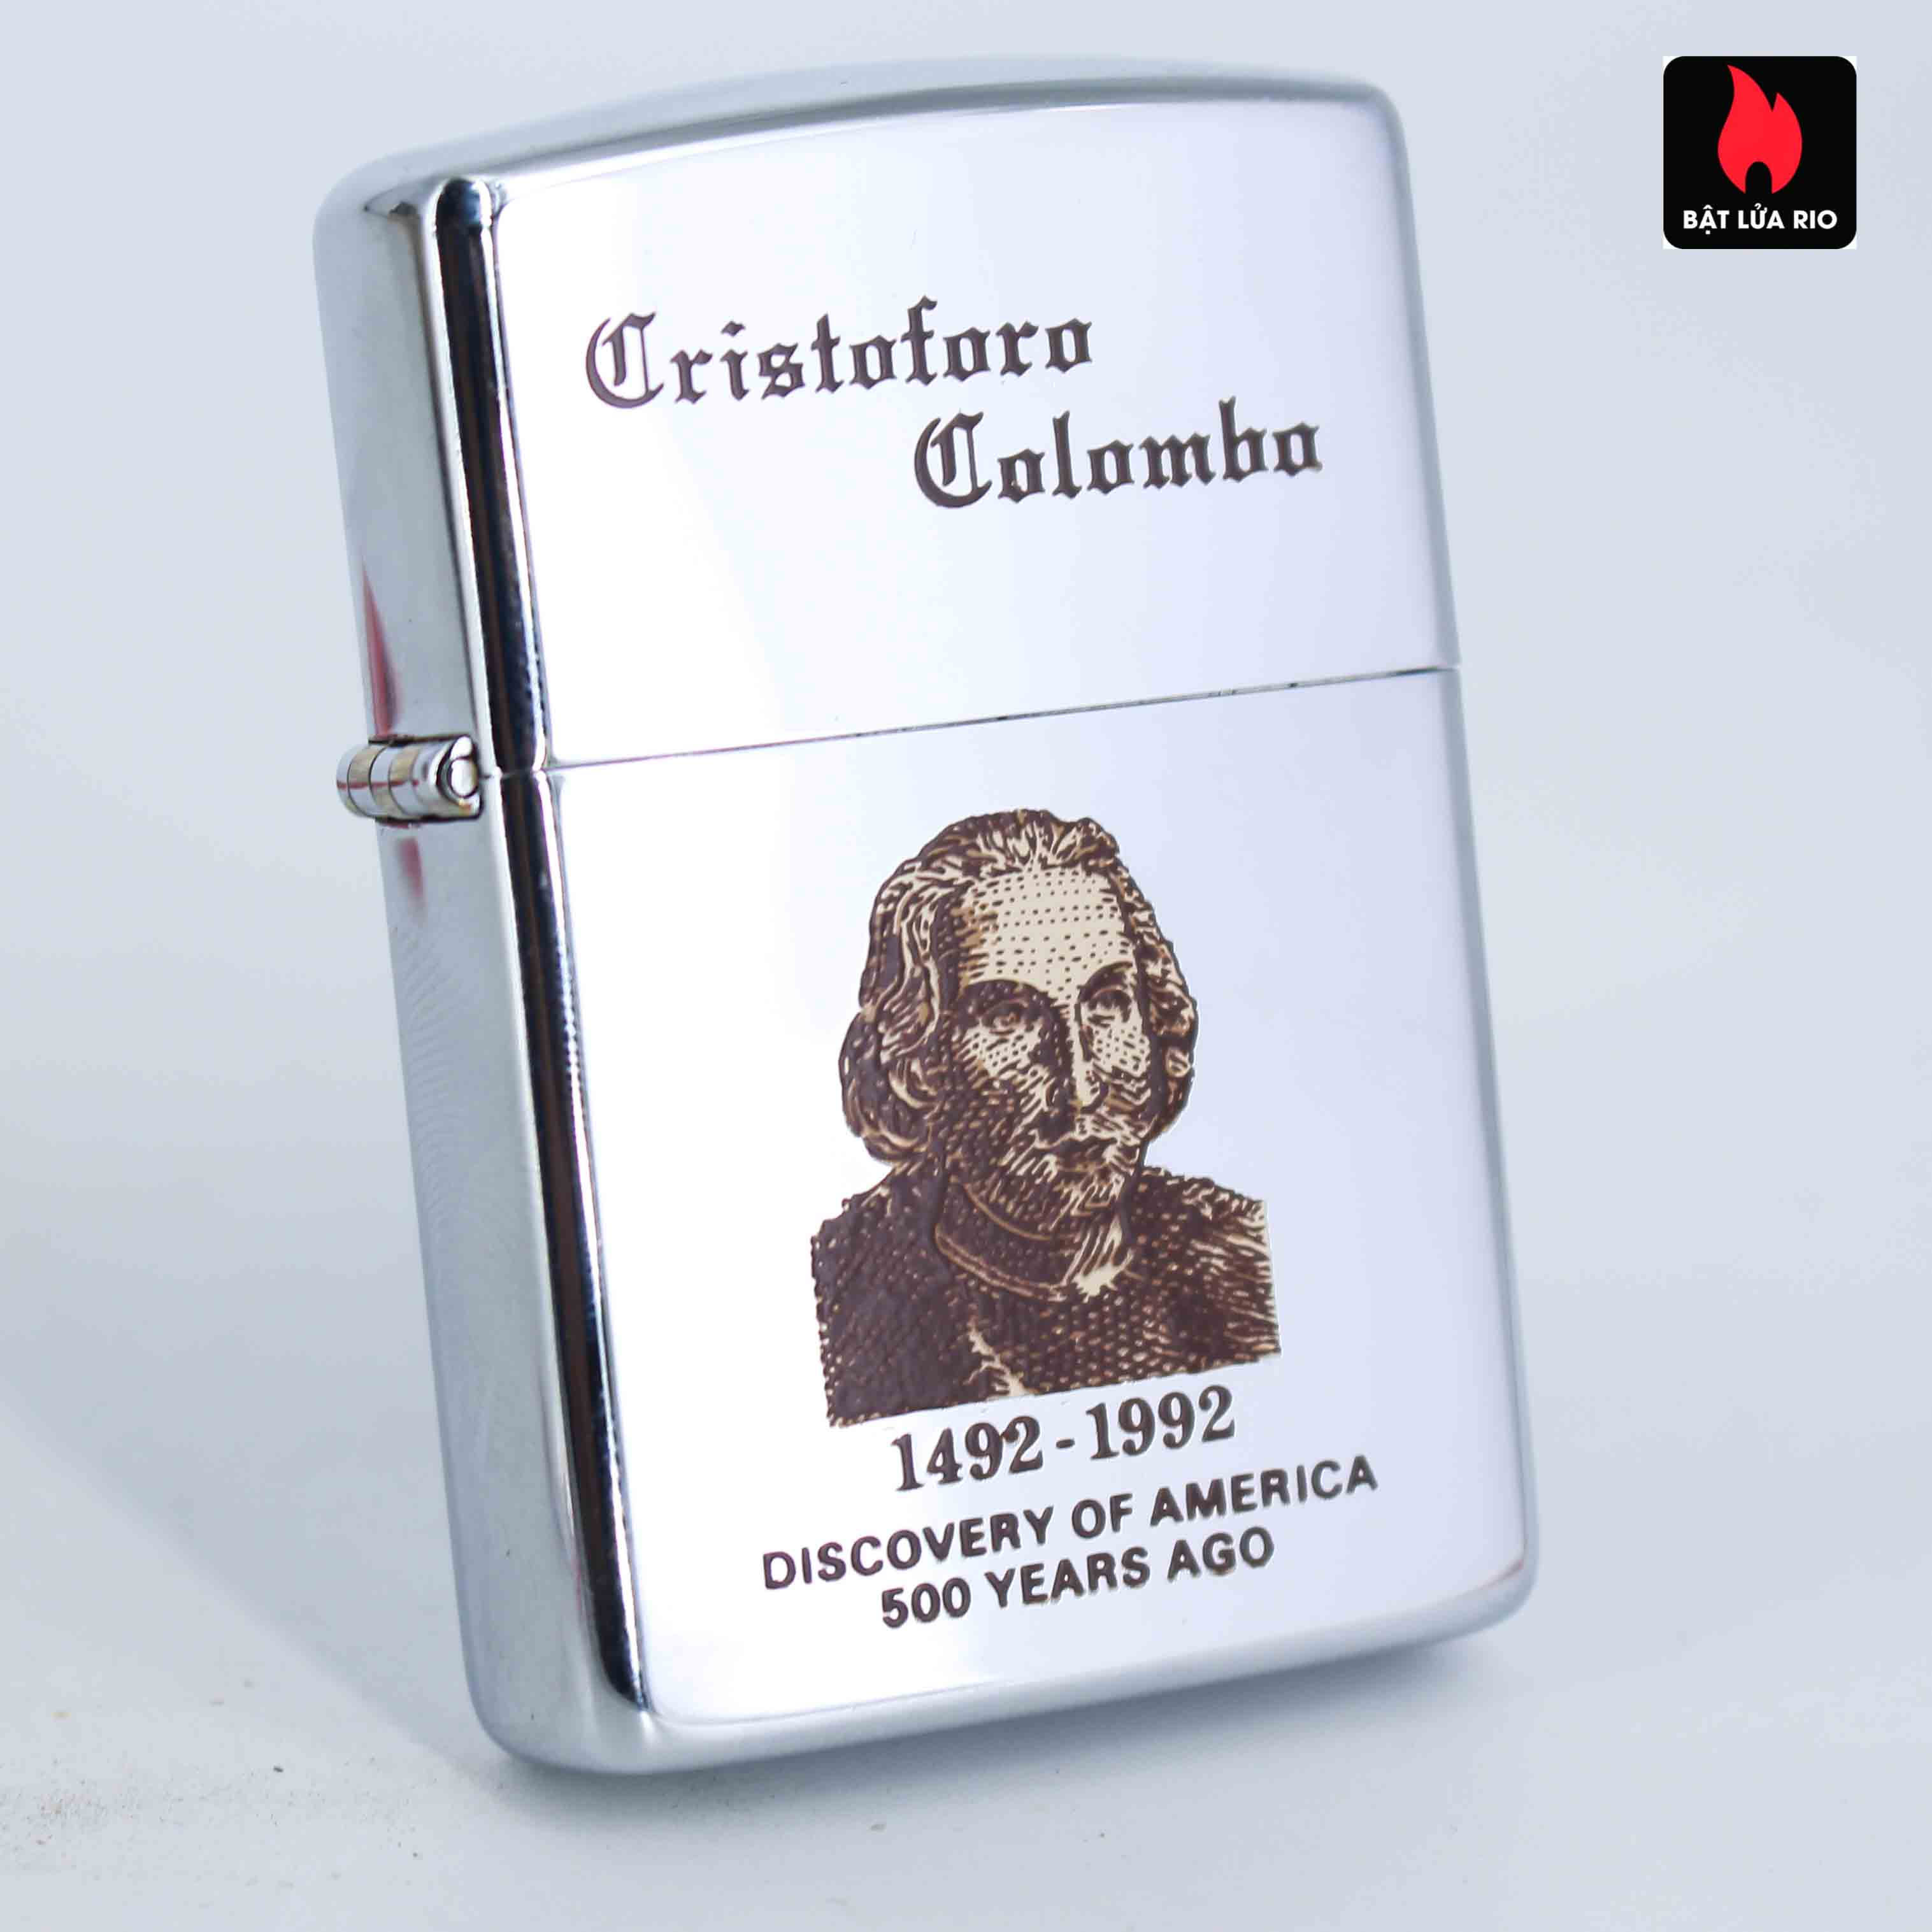 Zippo La Mã 1991 - Cristoforo Colombo 1492-1992